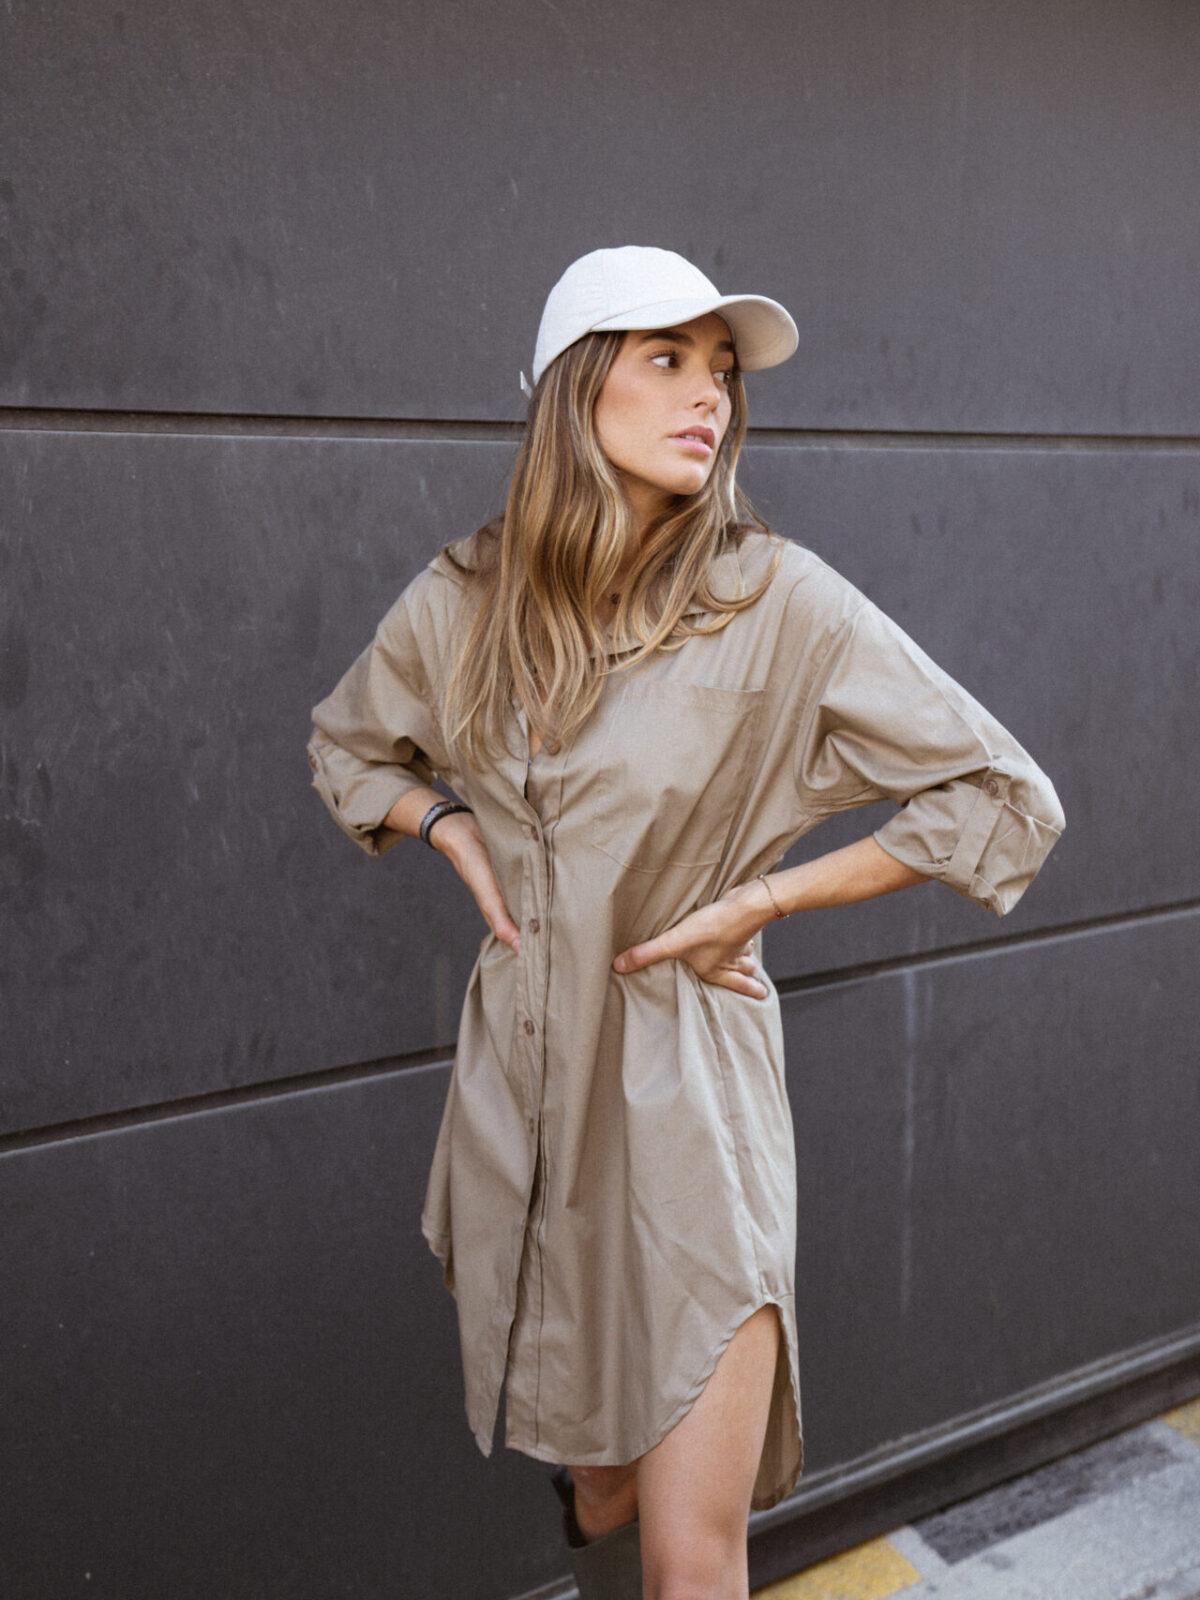 robe-chemise-beige-botte-de-pluie-casquette-femme-gisette-store (28)